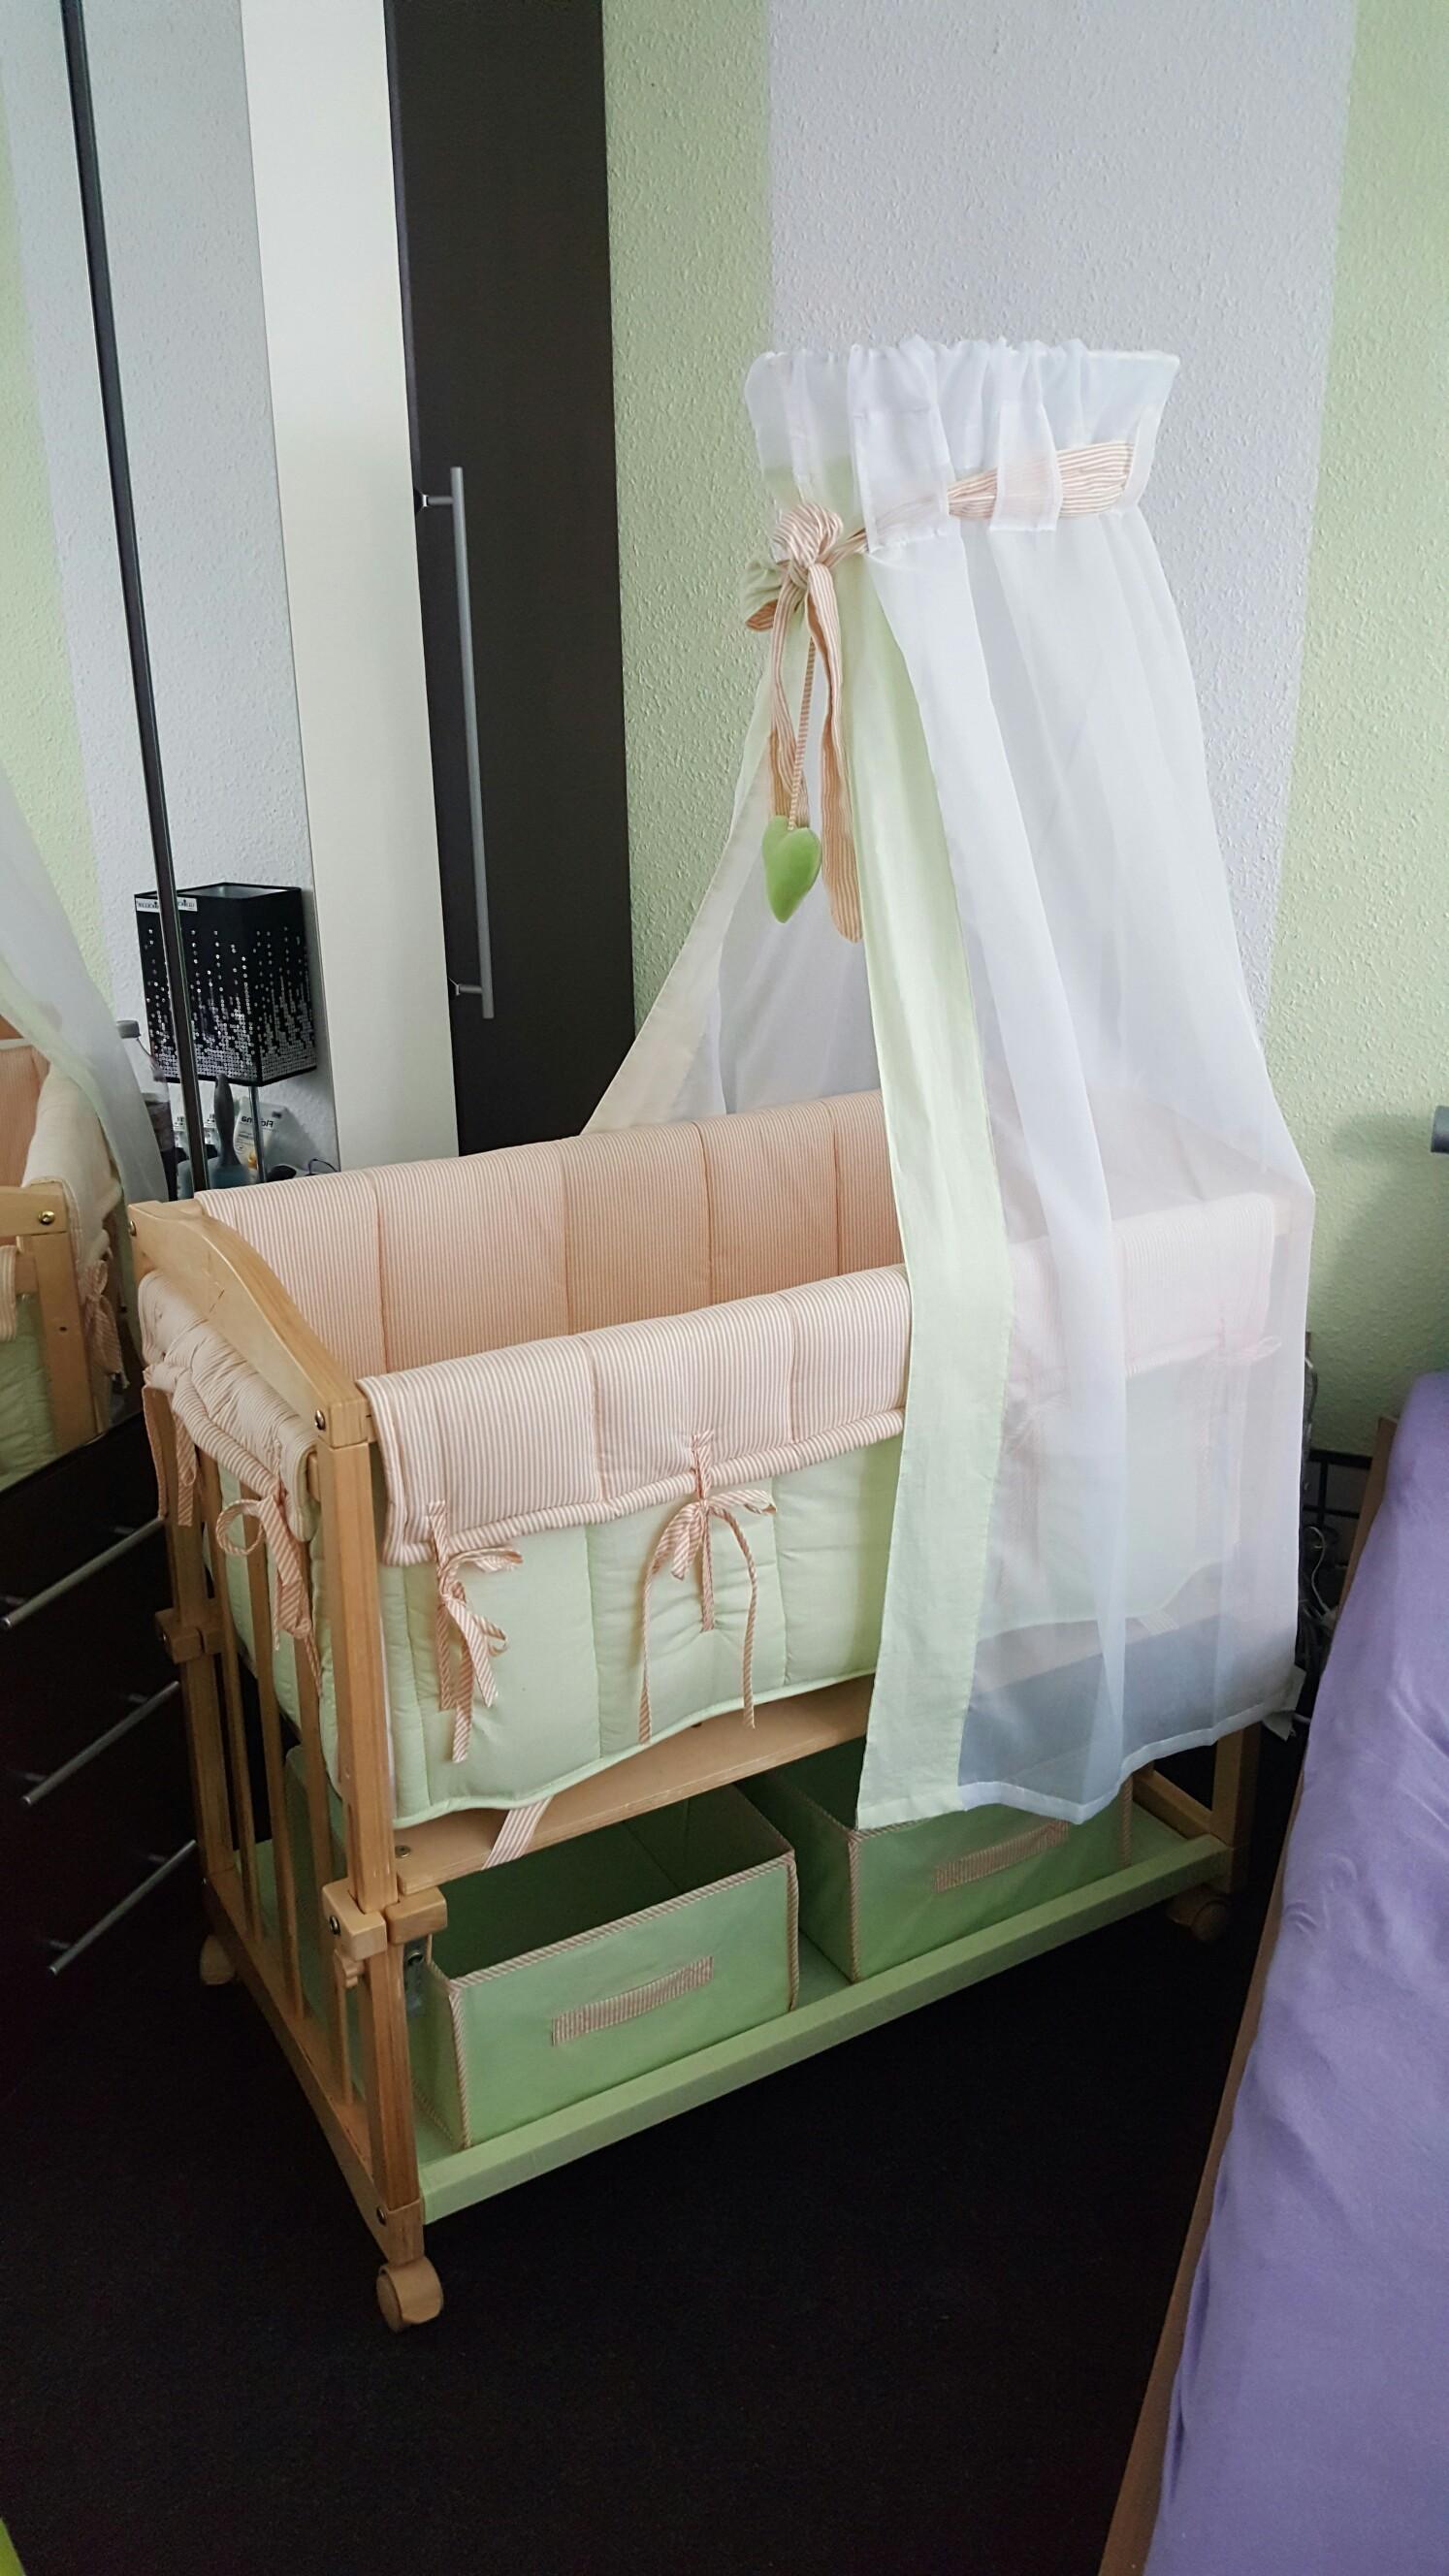 Babywiege babybett stubenwagen schaukelwiege wiege baby neu top